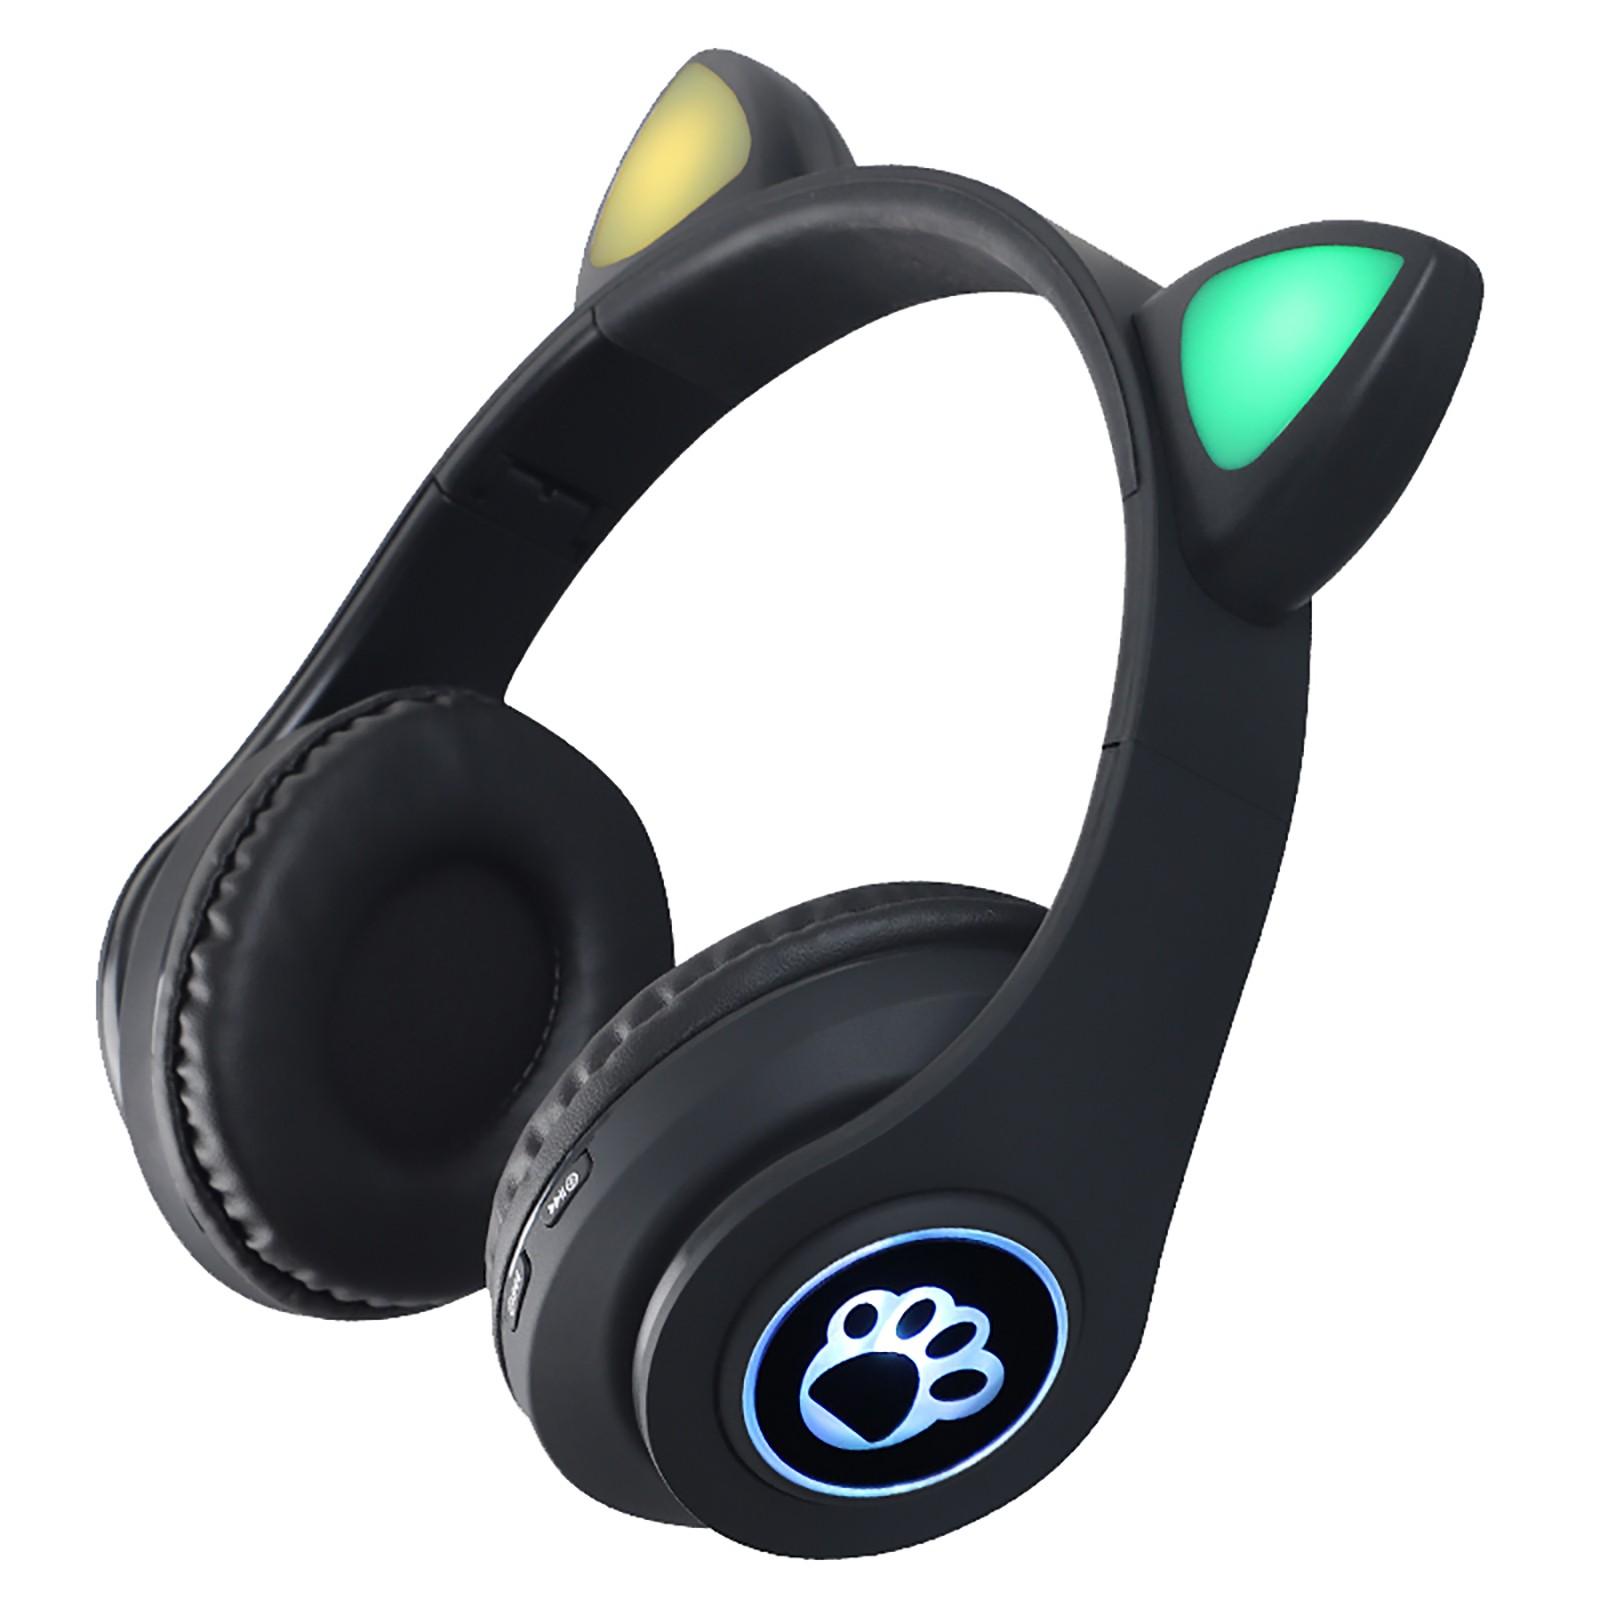 Gaming Earphones B39 Cat Ear Wireless 5.0 Luminous Noise Gaming Headset Bluetooth-compatible Headphones Black